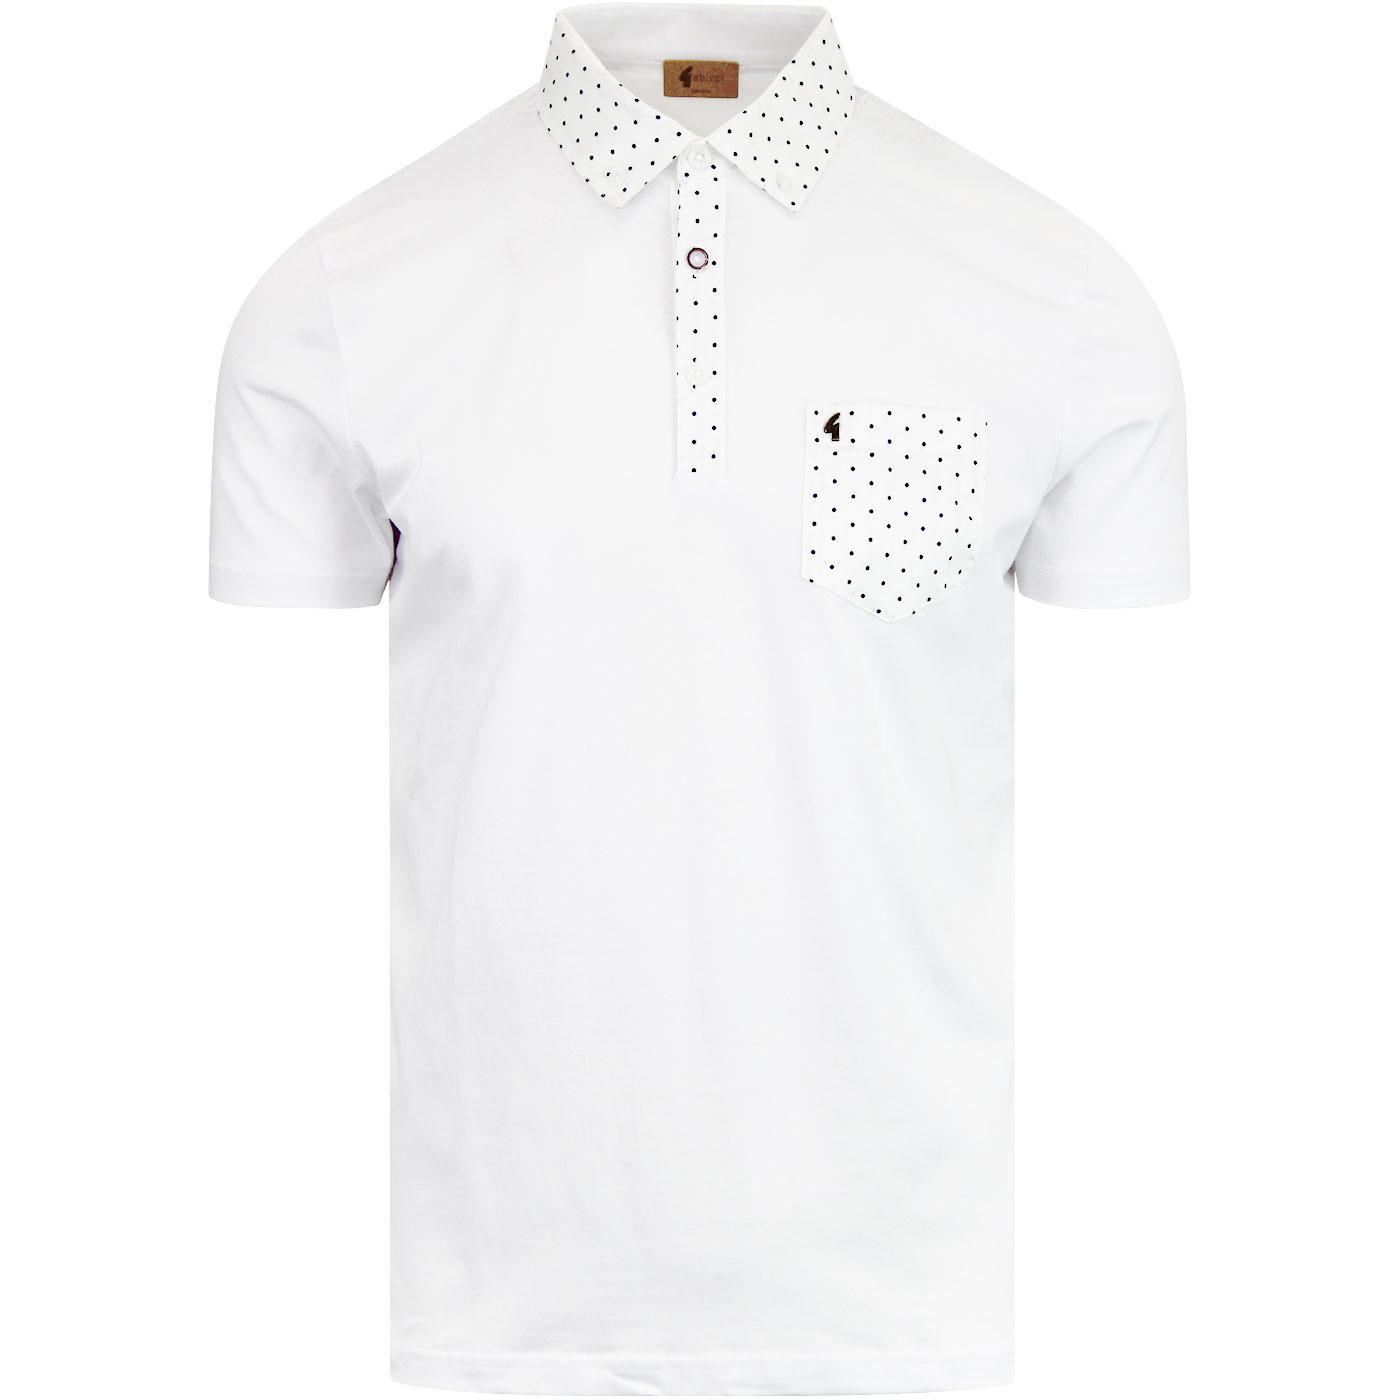 Kemble GABICCI VINTAGE Mod Polka Dot Shirting Polo